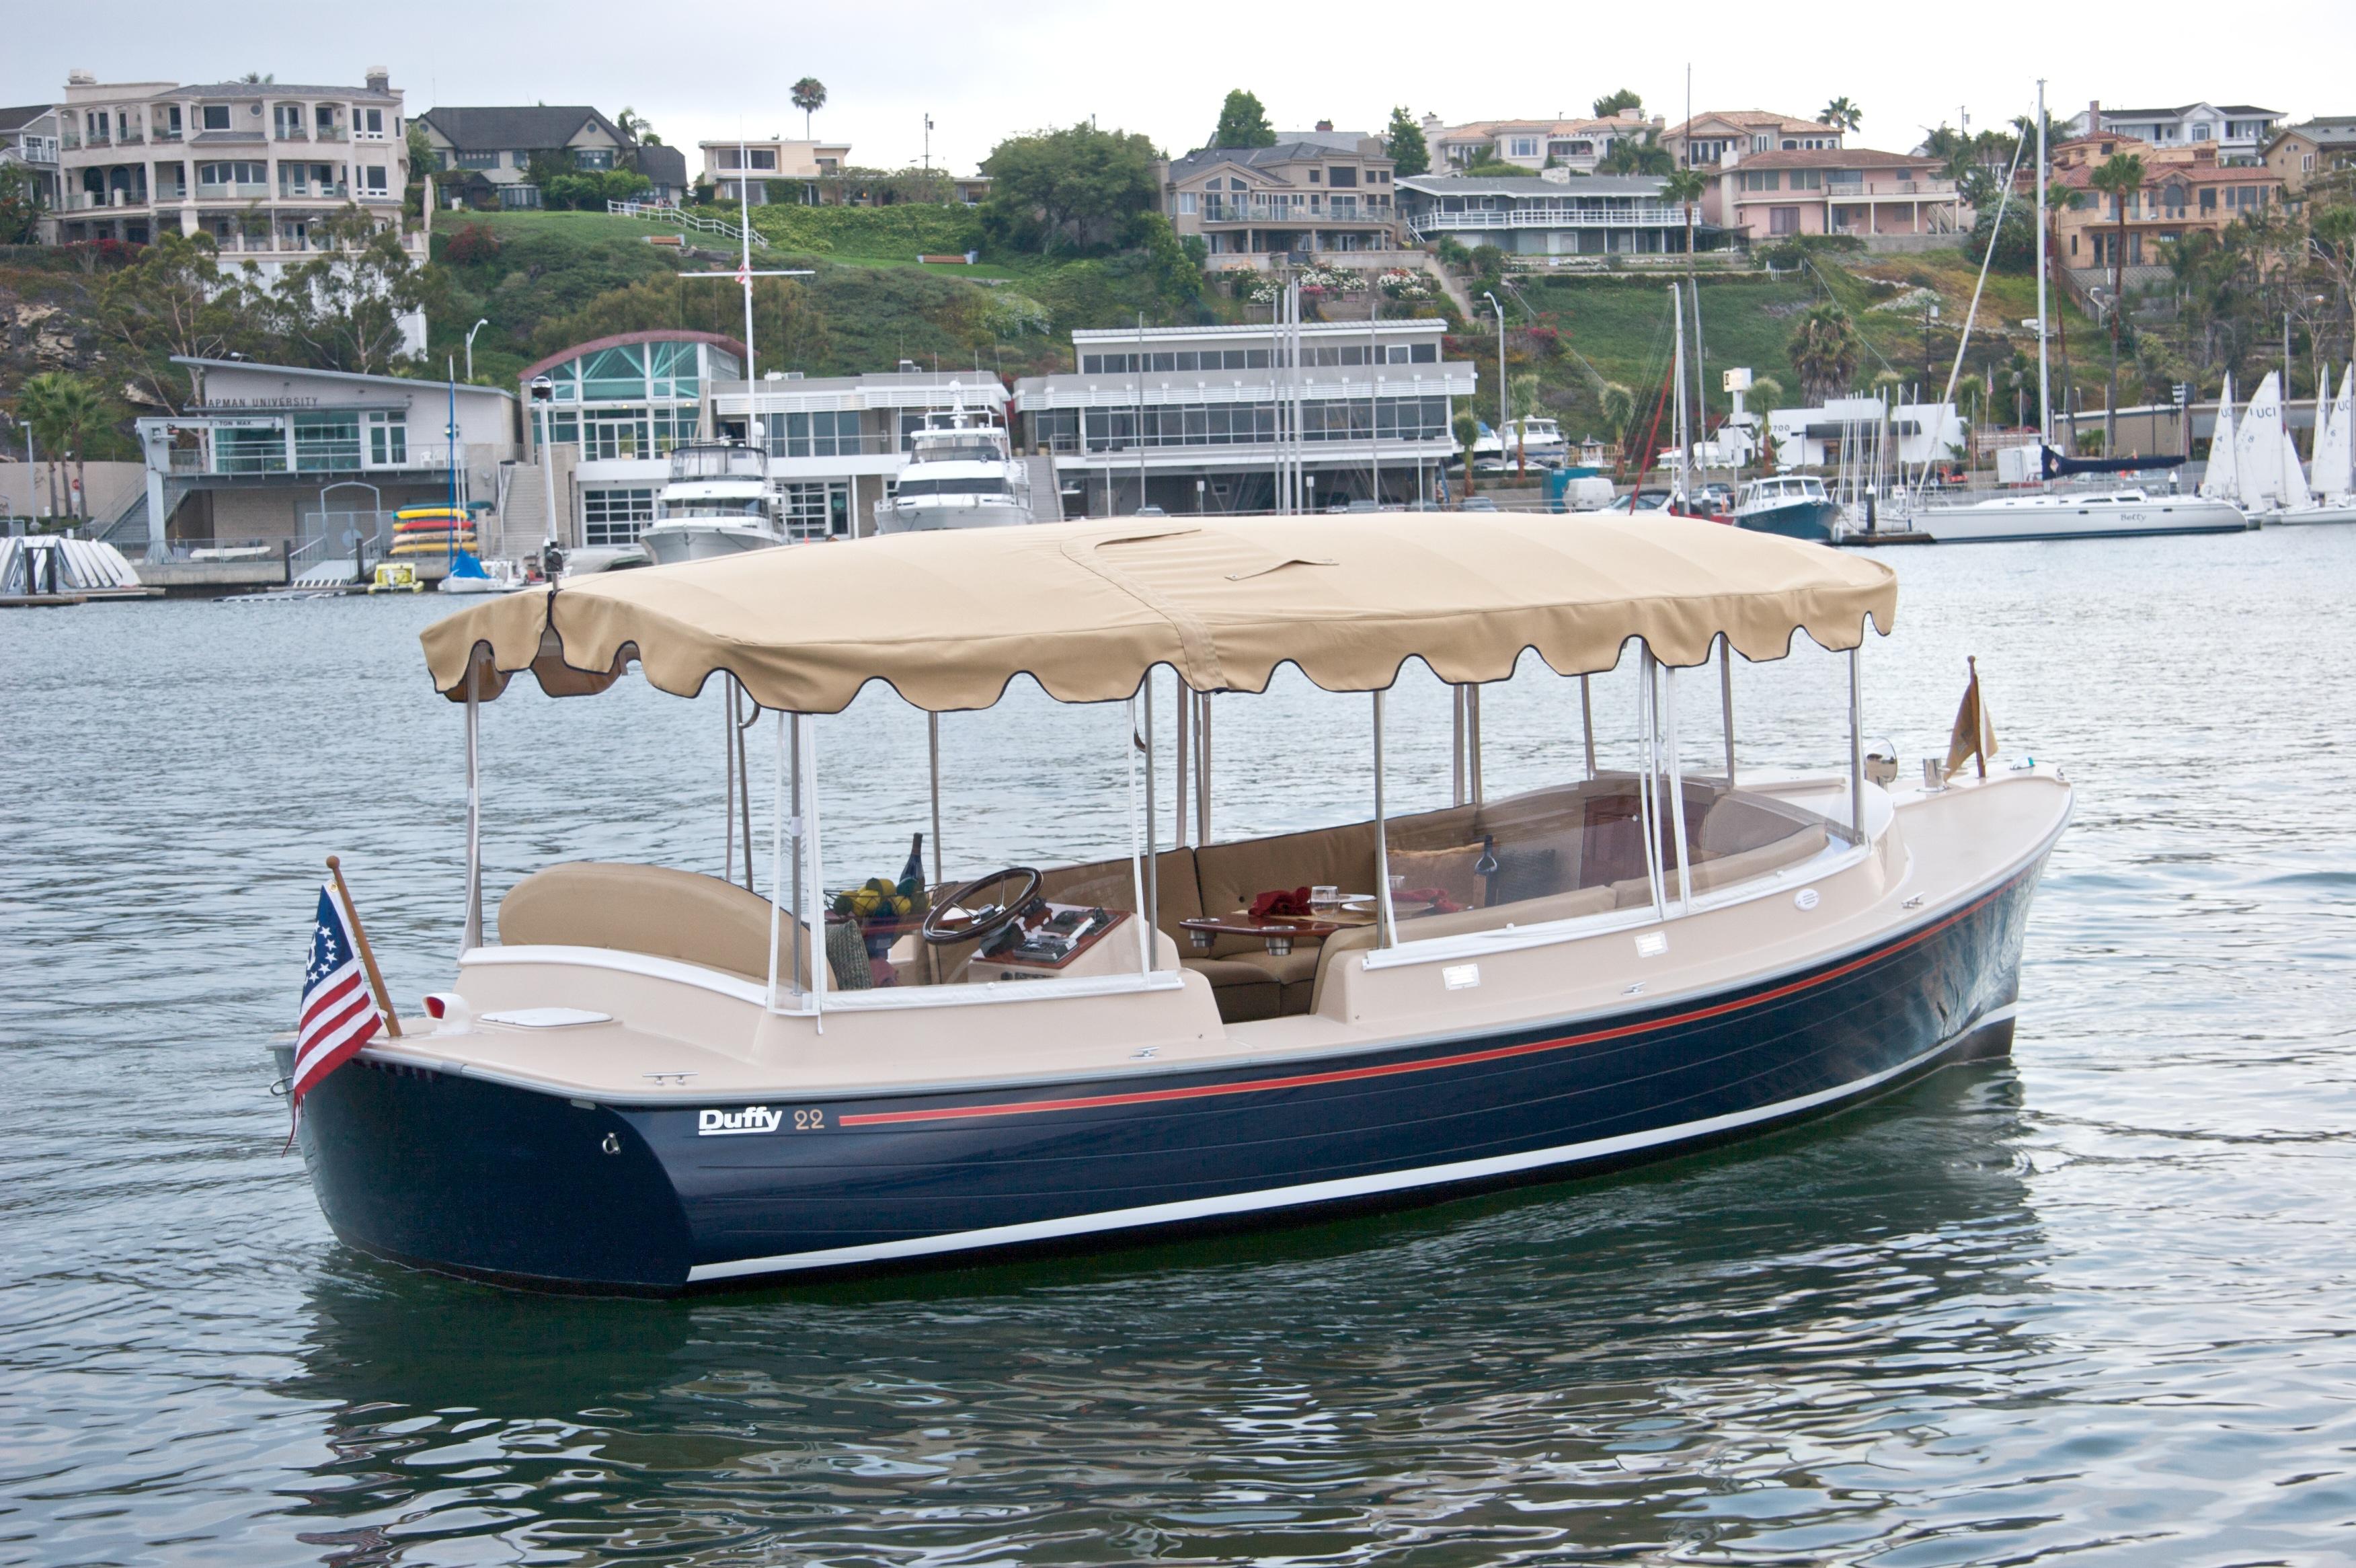 Duffy® Boat